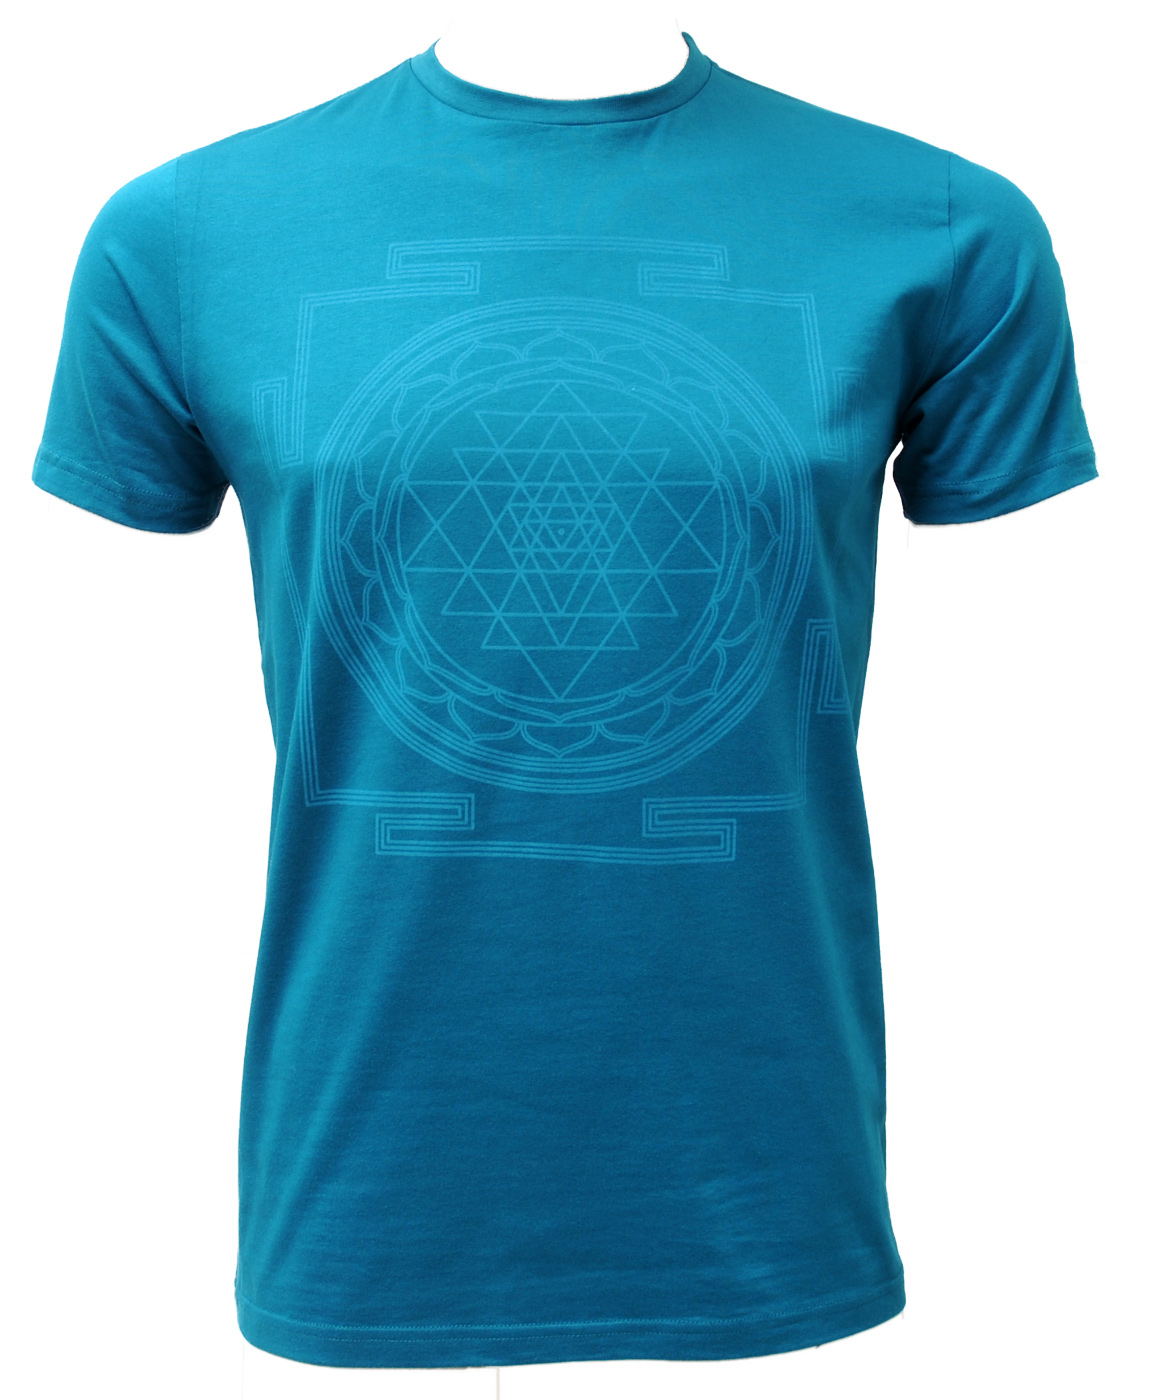 "Yogi-T-Shirt ""Sri Yantra"", men - petrol"